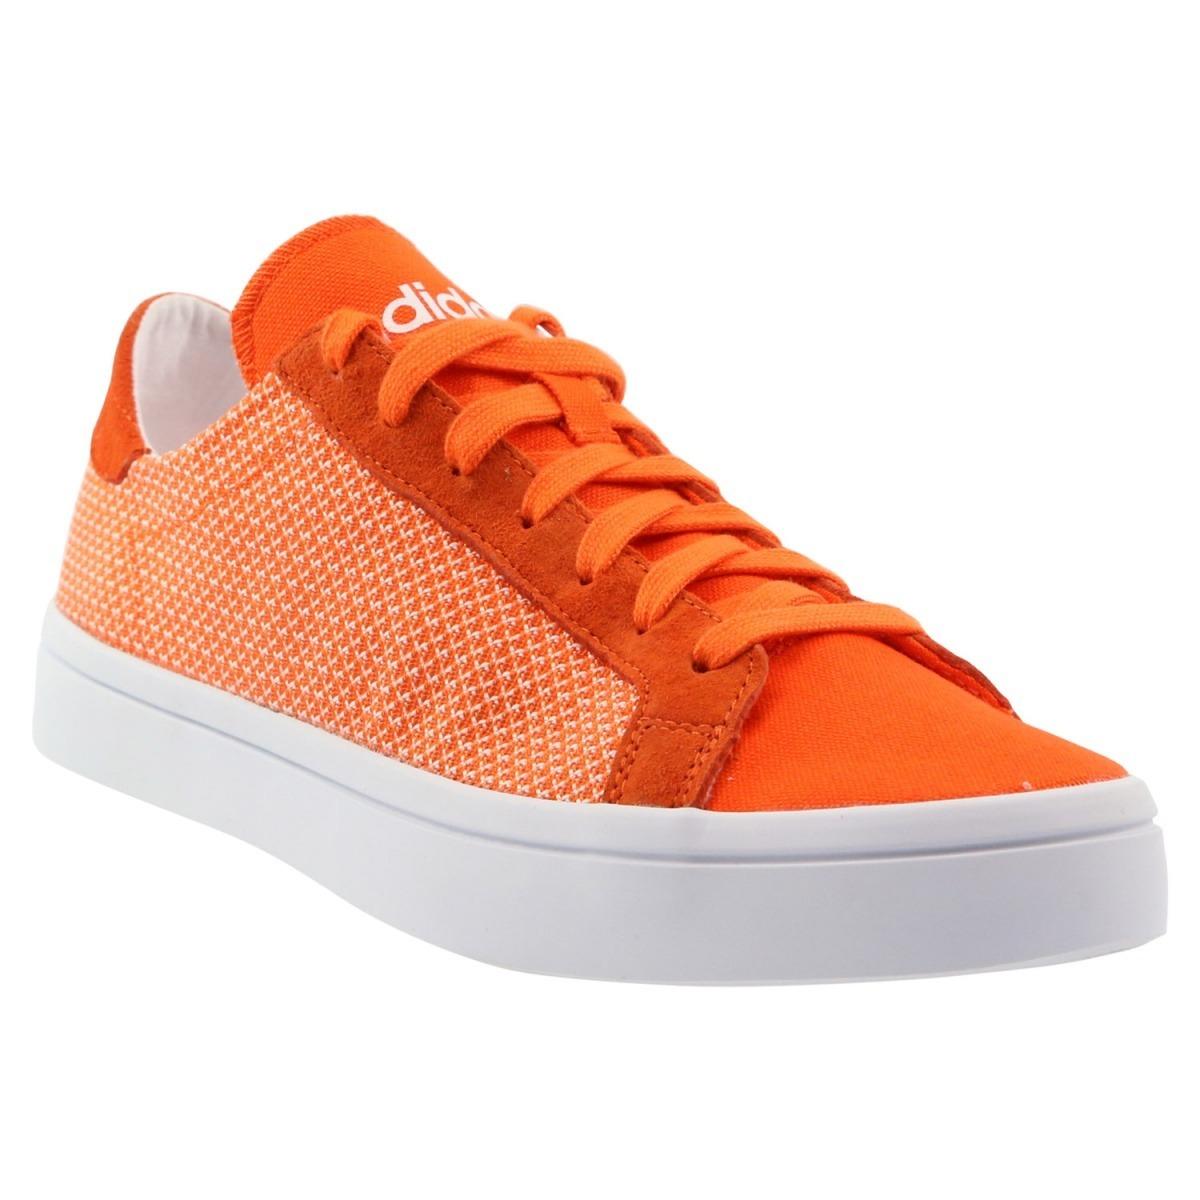 5c0166e47a6 Tenis adidas Courtvantage Originals No. S78773 -   800.00 en Mercado ...